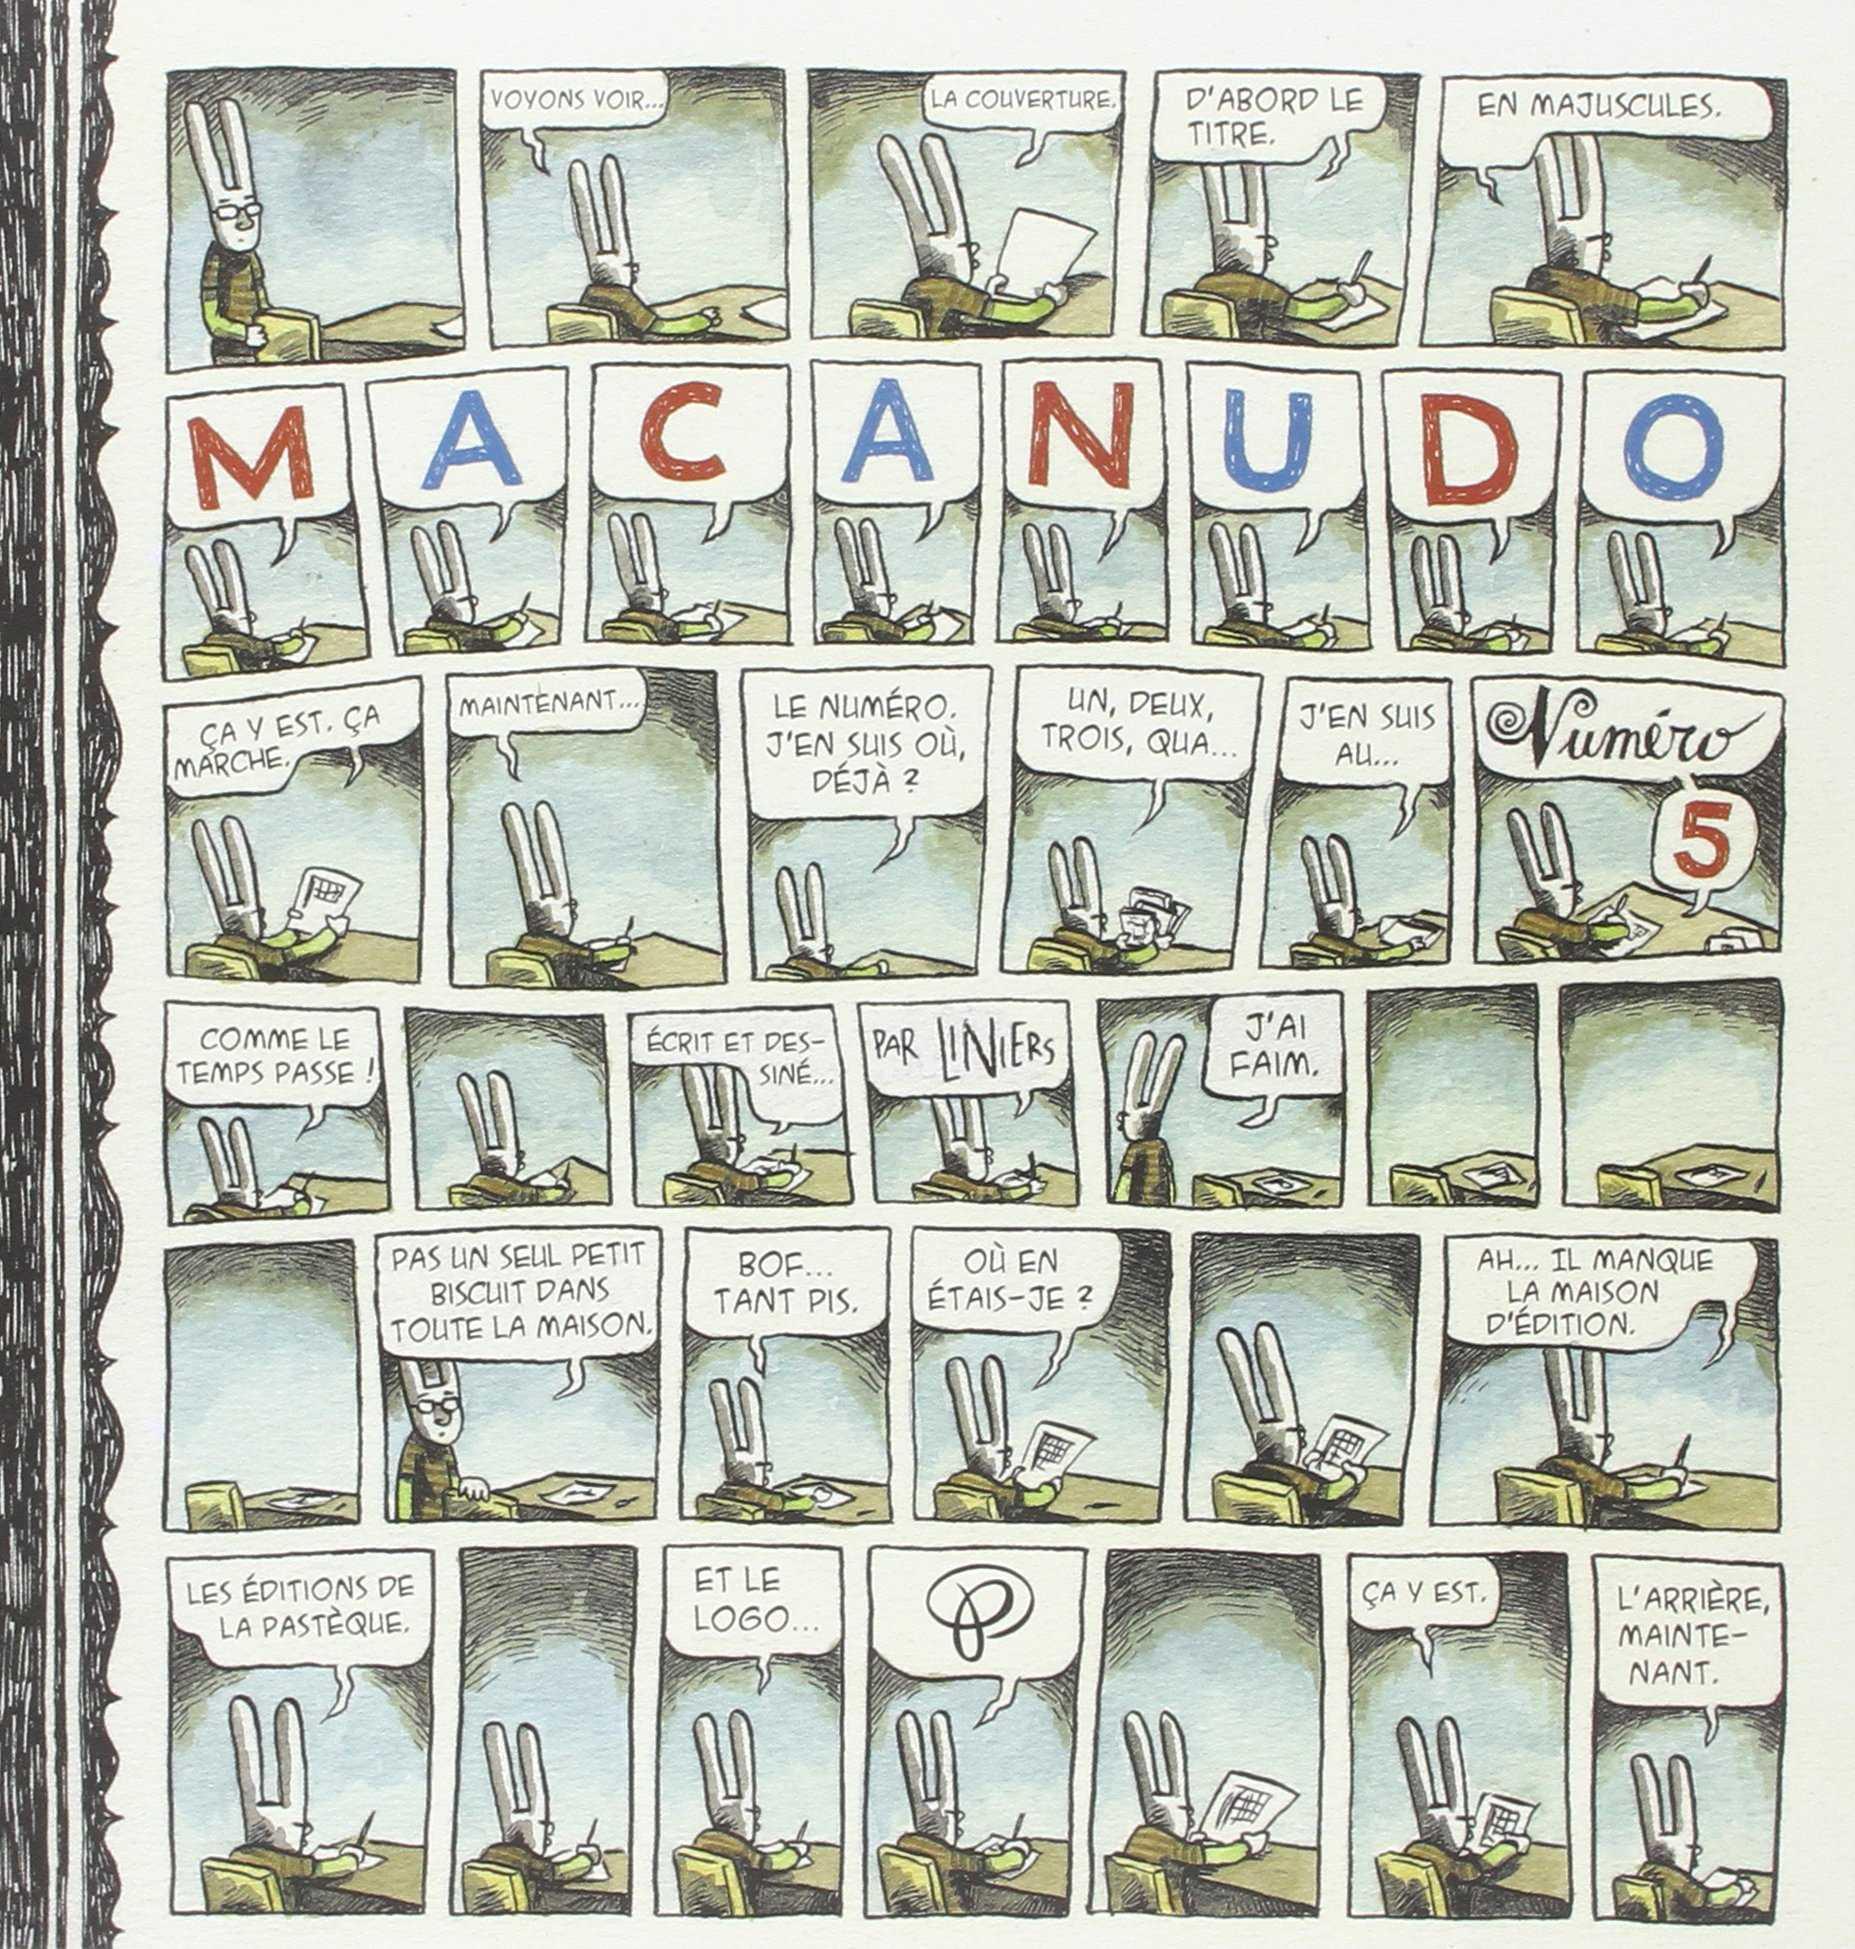 Macanudo 5, le monde poétique de Liniers